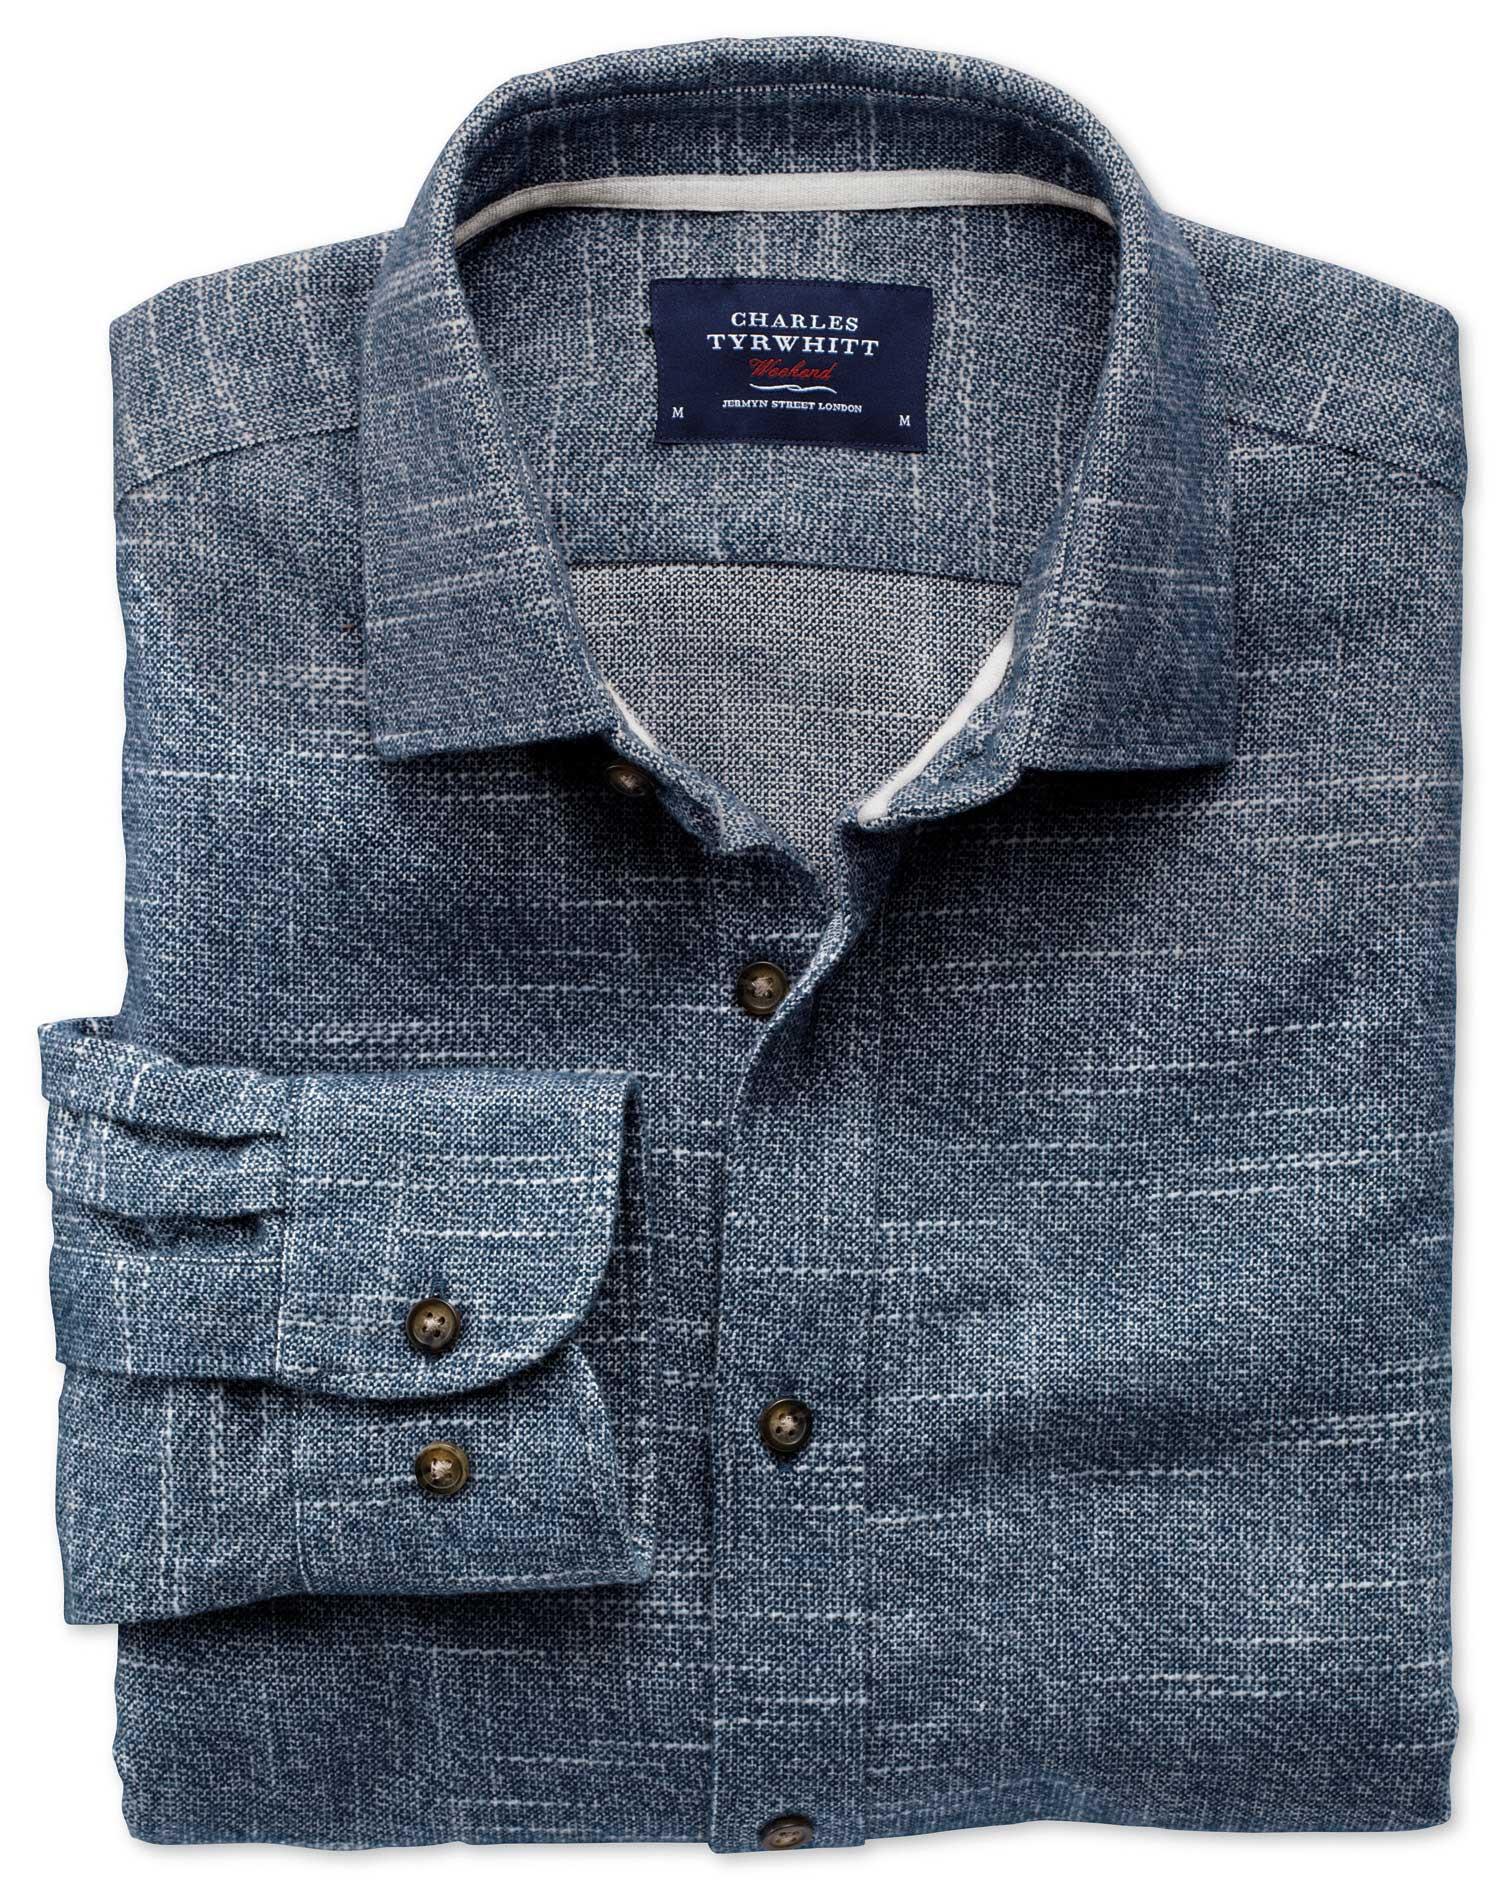 Slim Fit Slub Cotton Blue and White Shirt Single Cuff Size XS by Charles Tyrwhitt